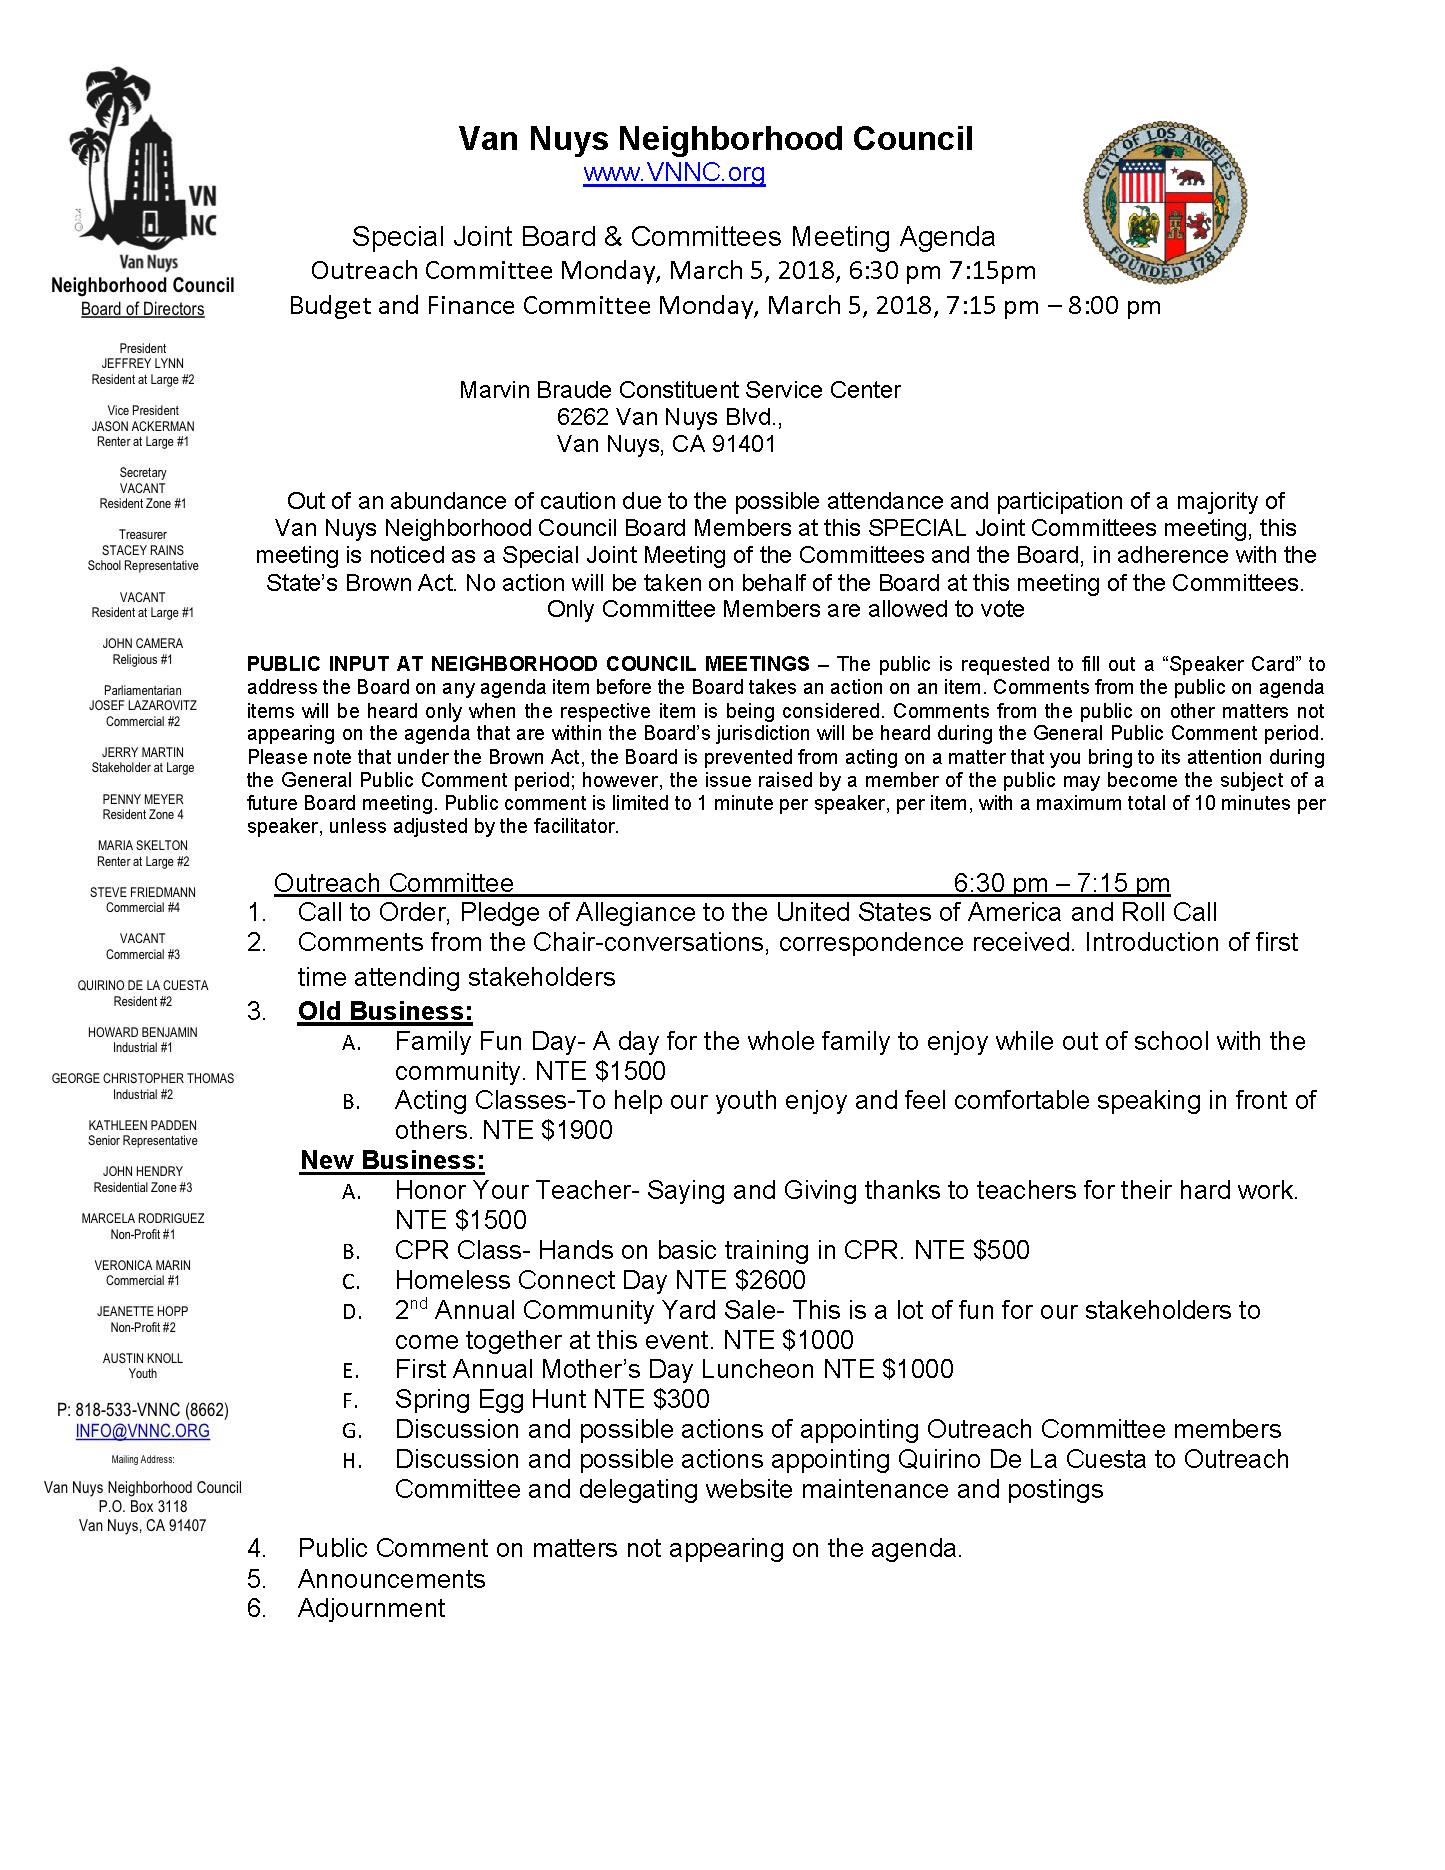 Van nuys neighborhood council the van nuys neighborhood council link agenda with supporting documents 1betcityfo Choice Image